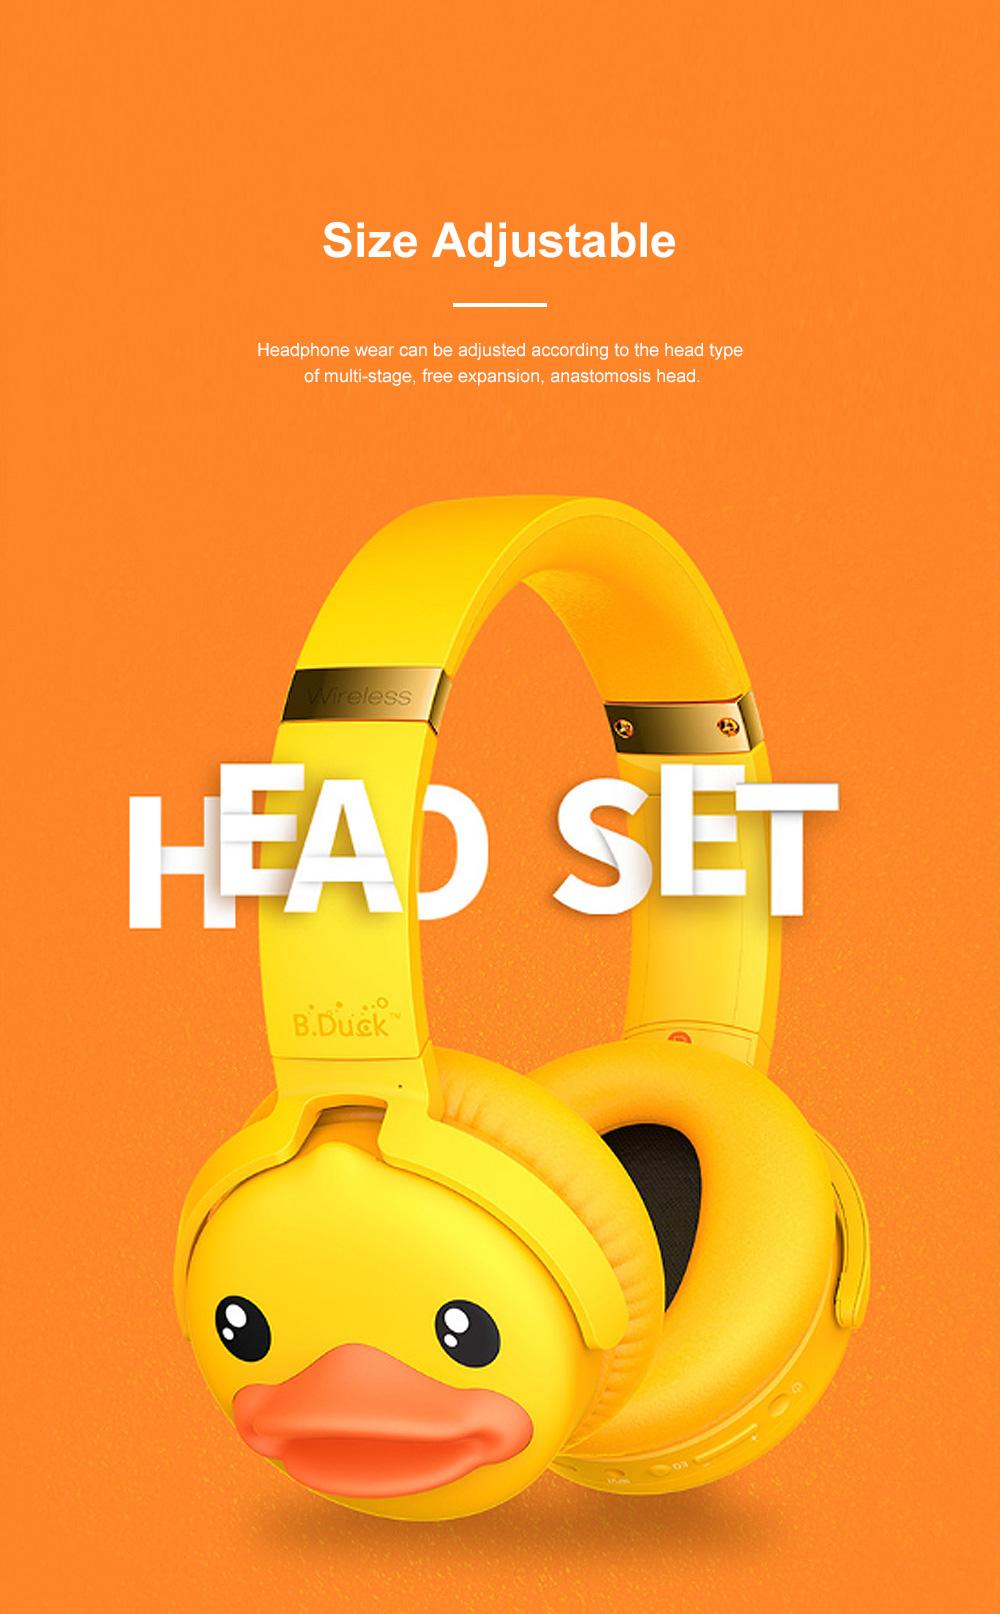 B.Duck Bluetooth Headphones Wireless Headset for Women Men Mobile Noise Reduction Sports Headphones Music Stereo 4